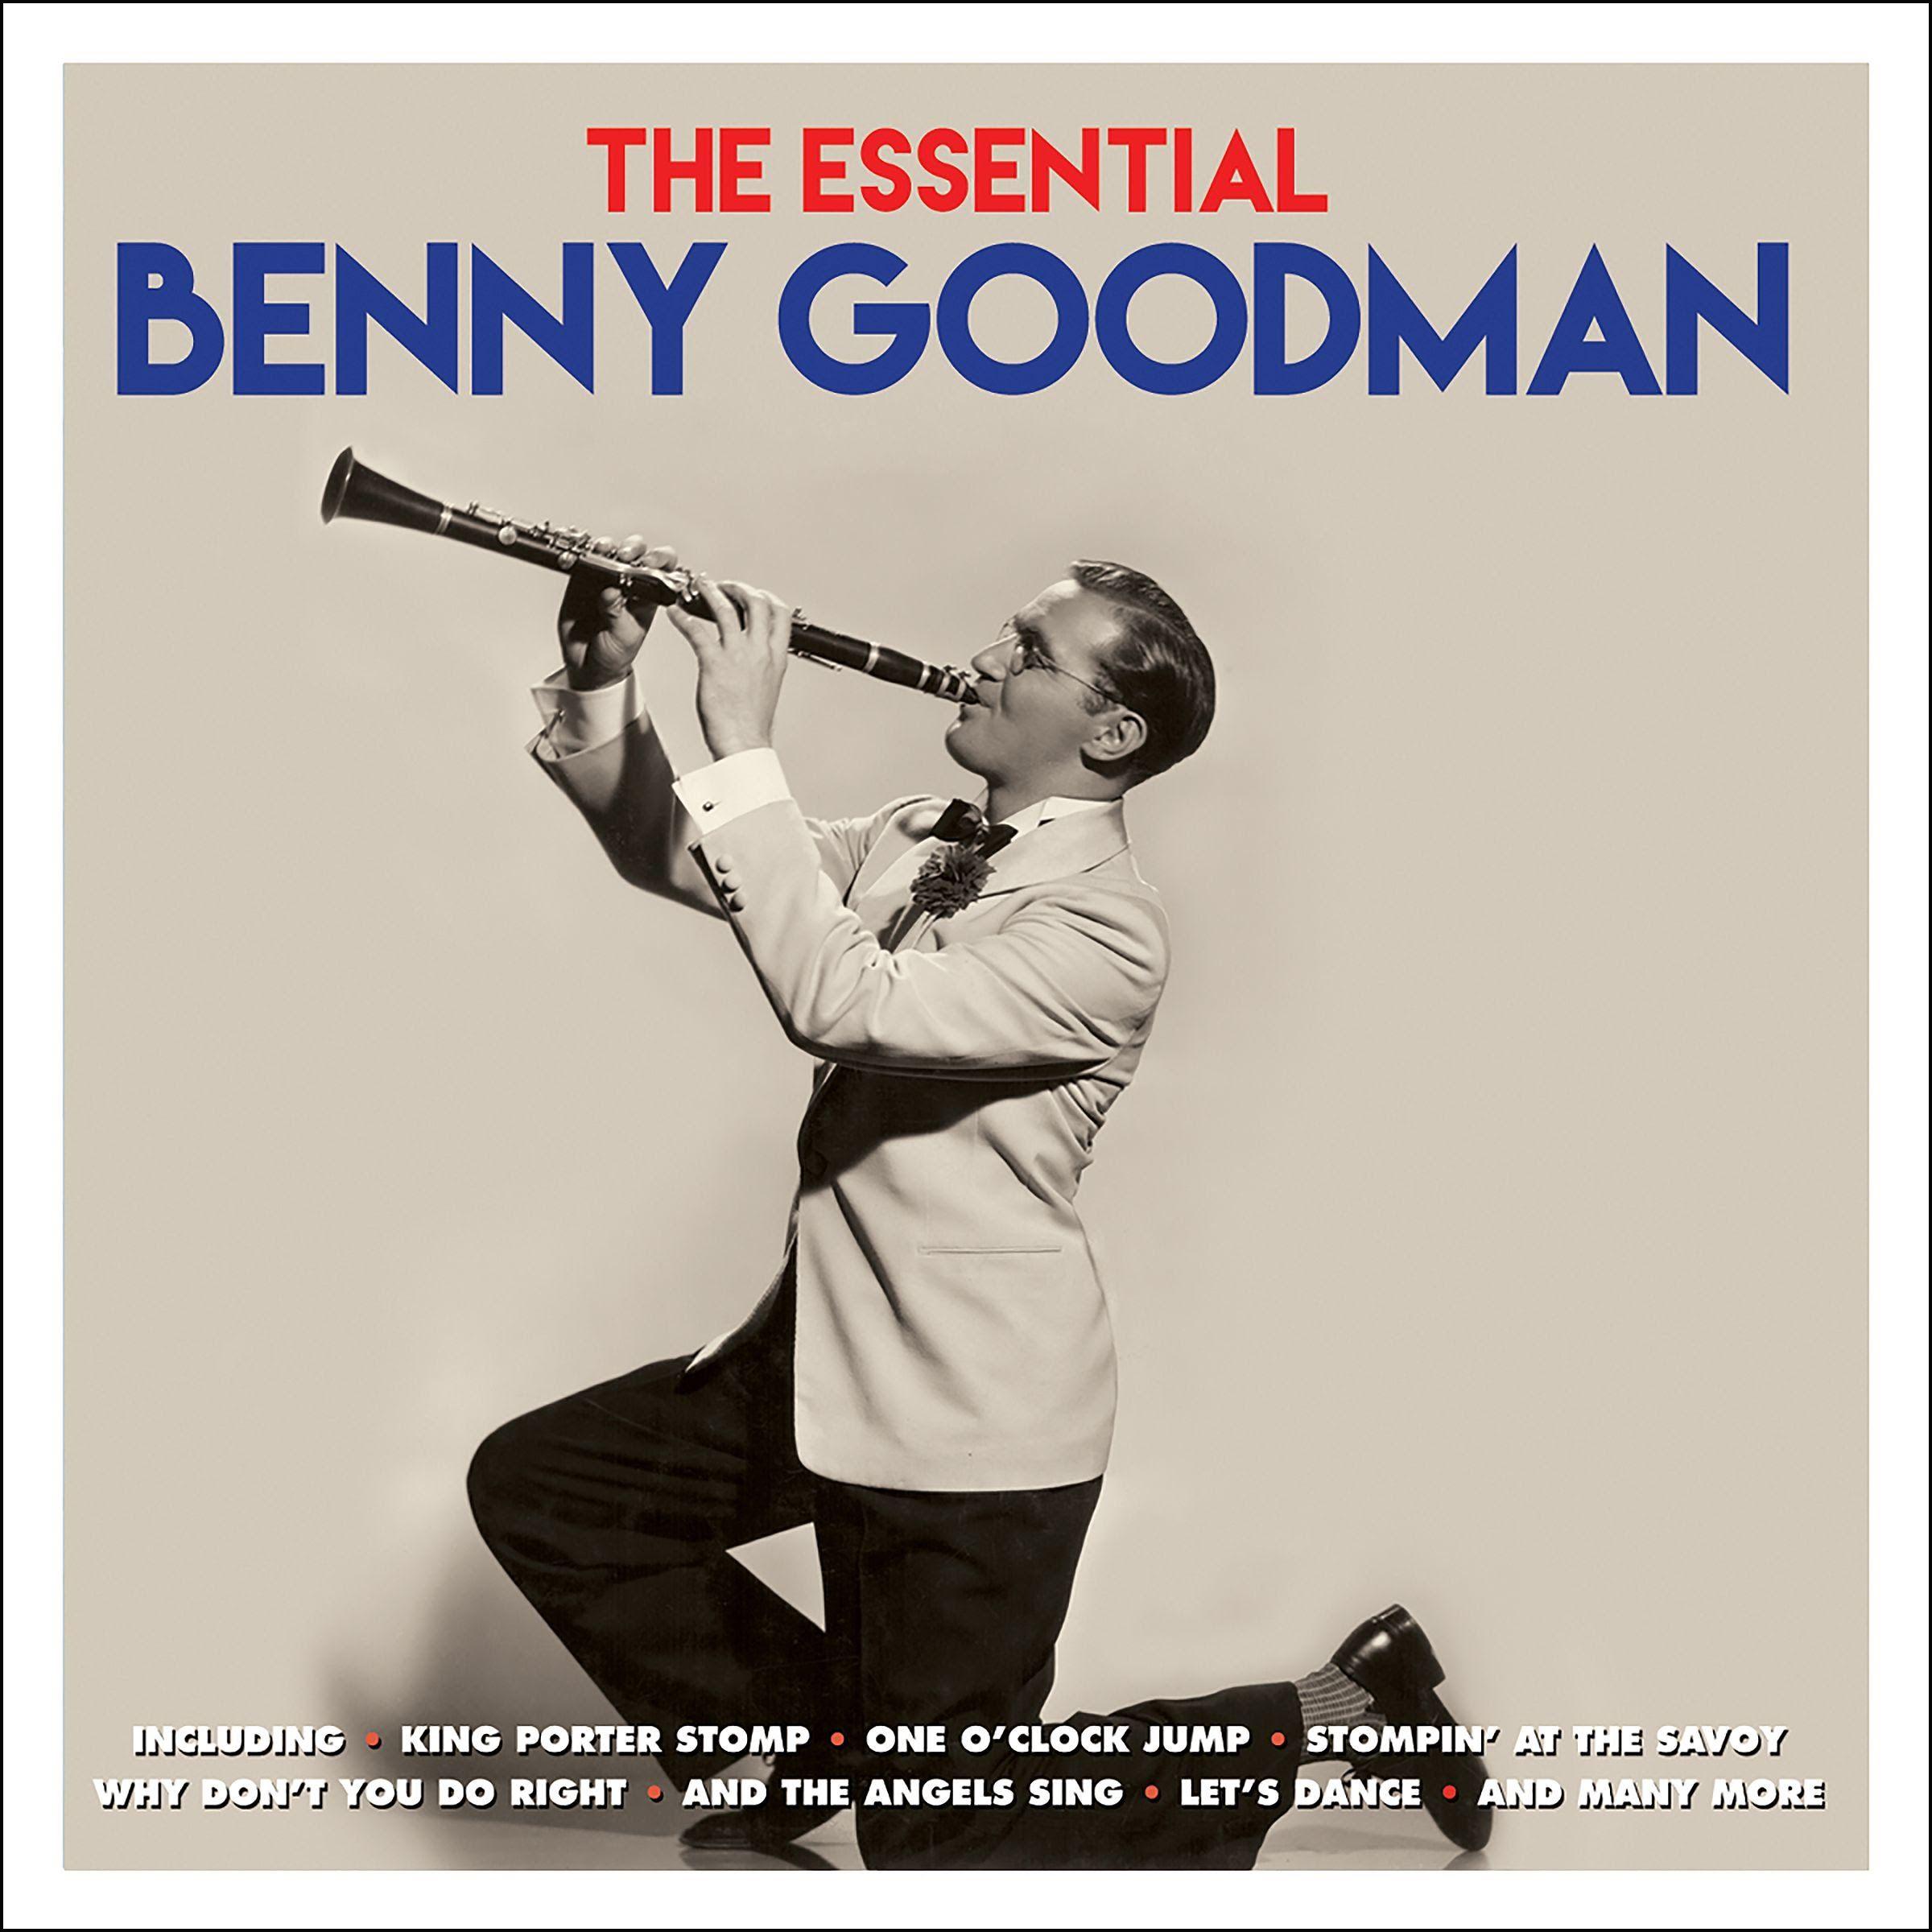 Benny Goodman The Essential (Not Now Music) [Full Album